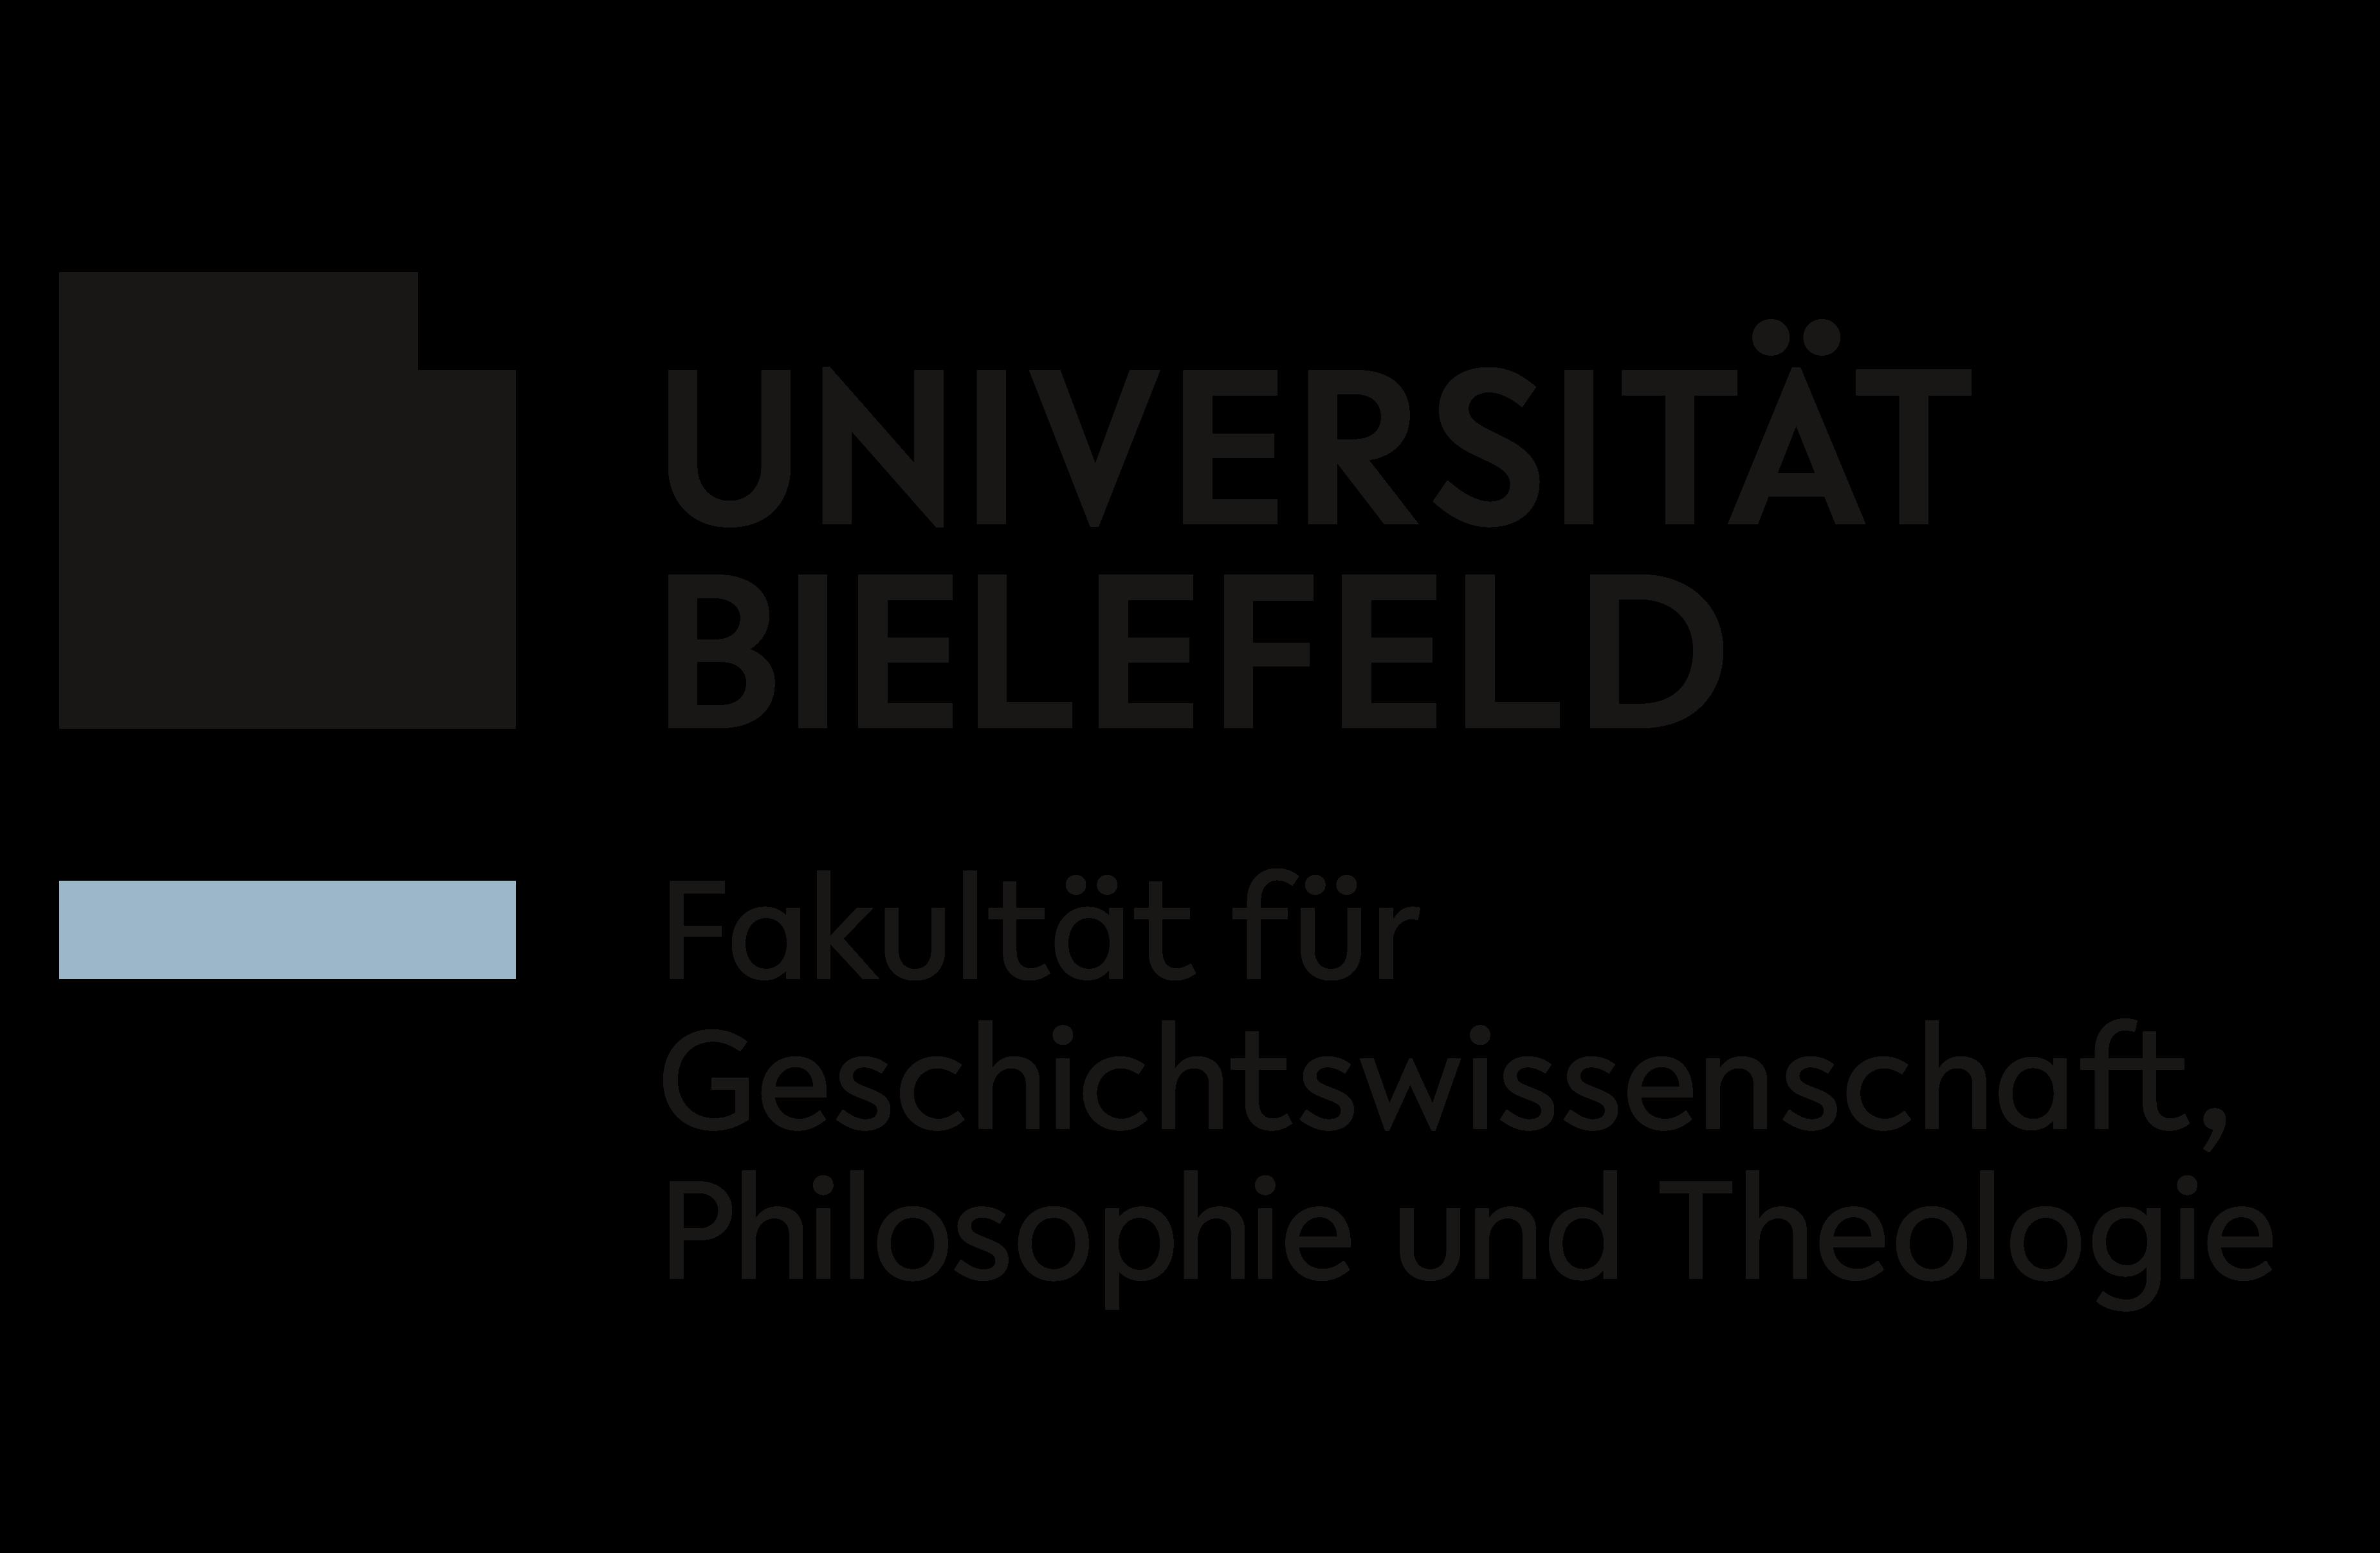 Digital History an der Universität Bielefeld (@BieDigital)